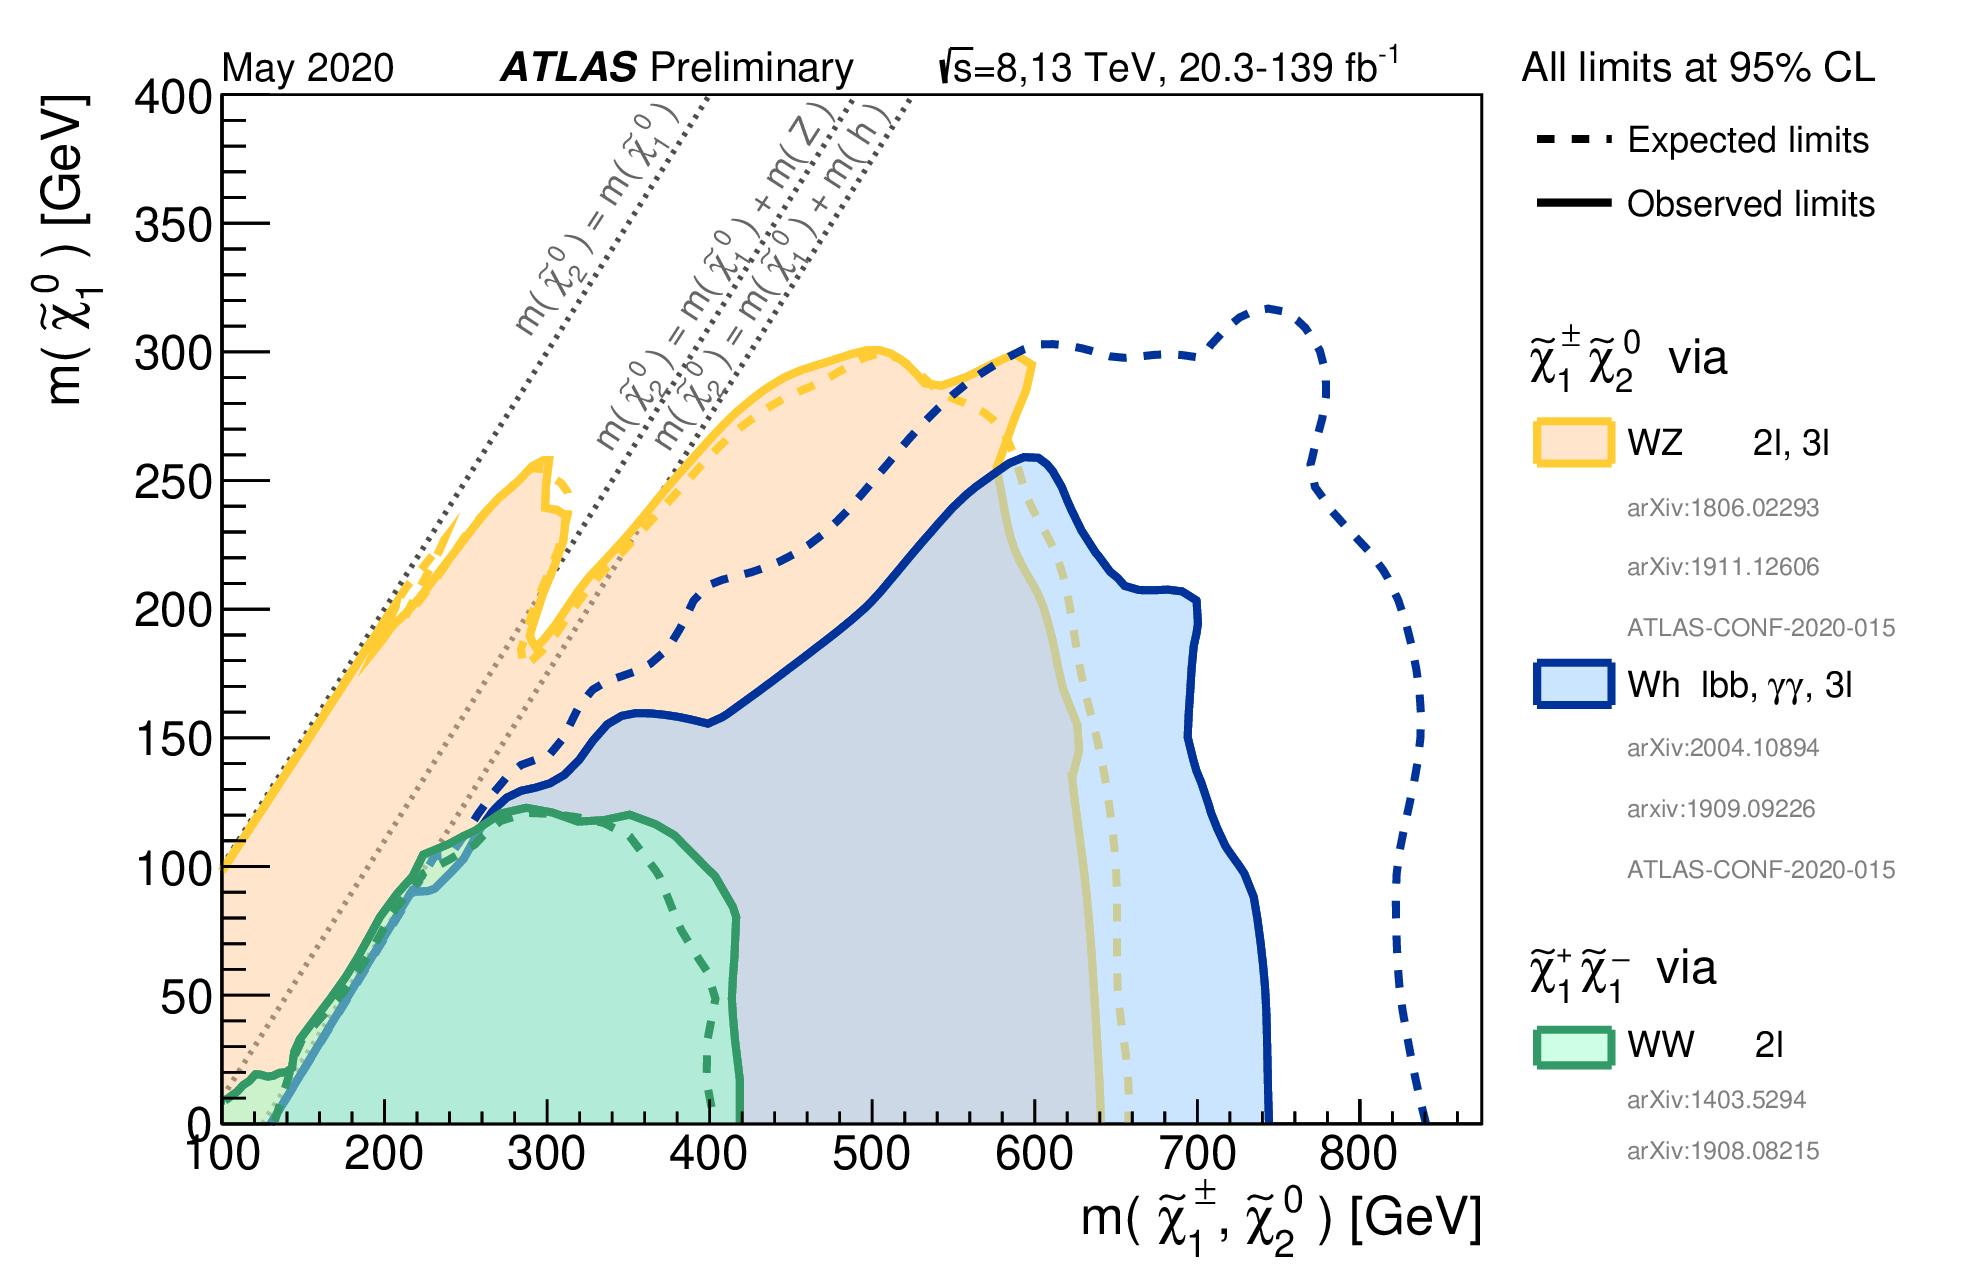 https://atlas.web.cern.ch/Atlas/GROUPS/PHYSICS/CombinedSummaryPlots/SUSY/ATLAS_SUSY_EWSummary_WH/ATLAS_SUSY_EWSummary_WH.png